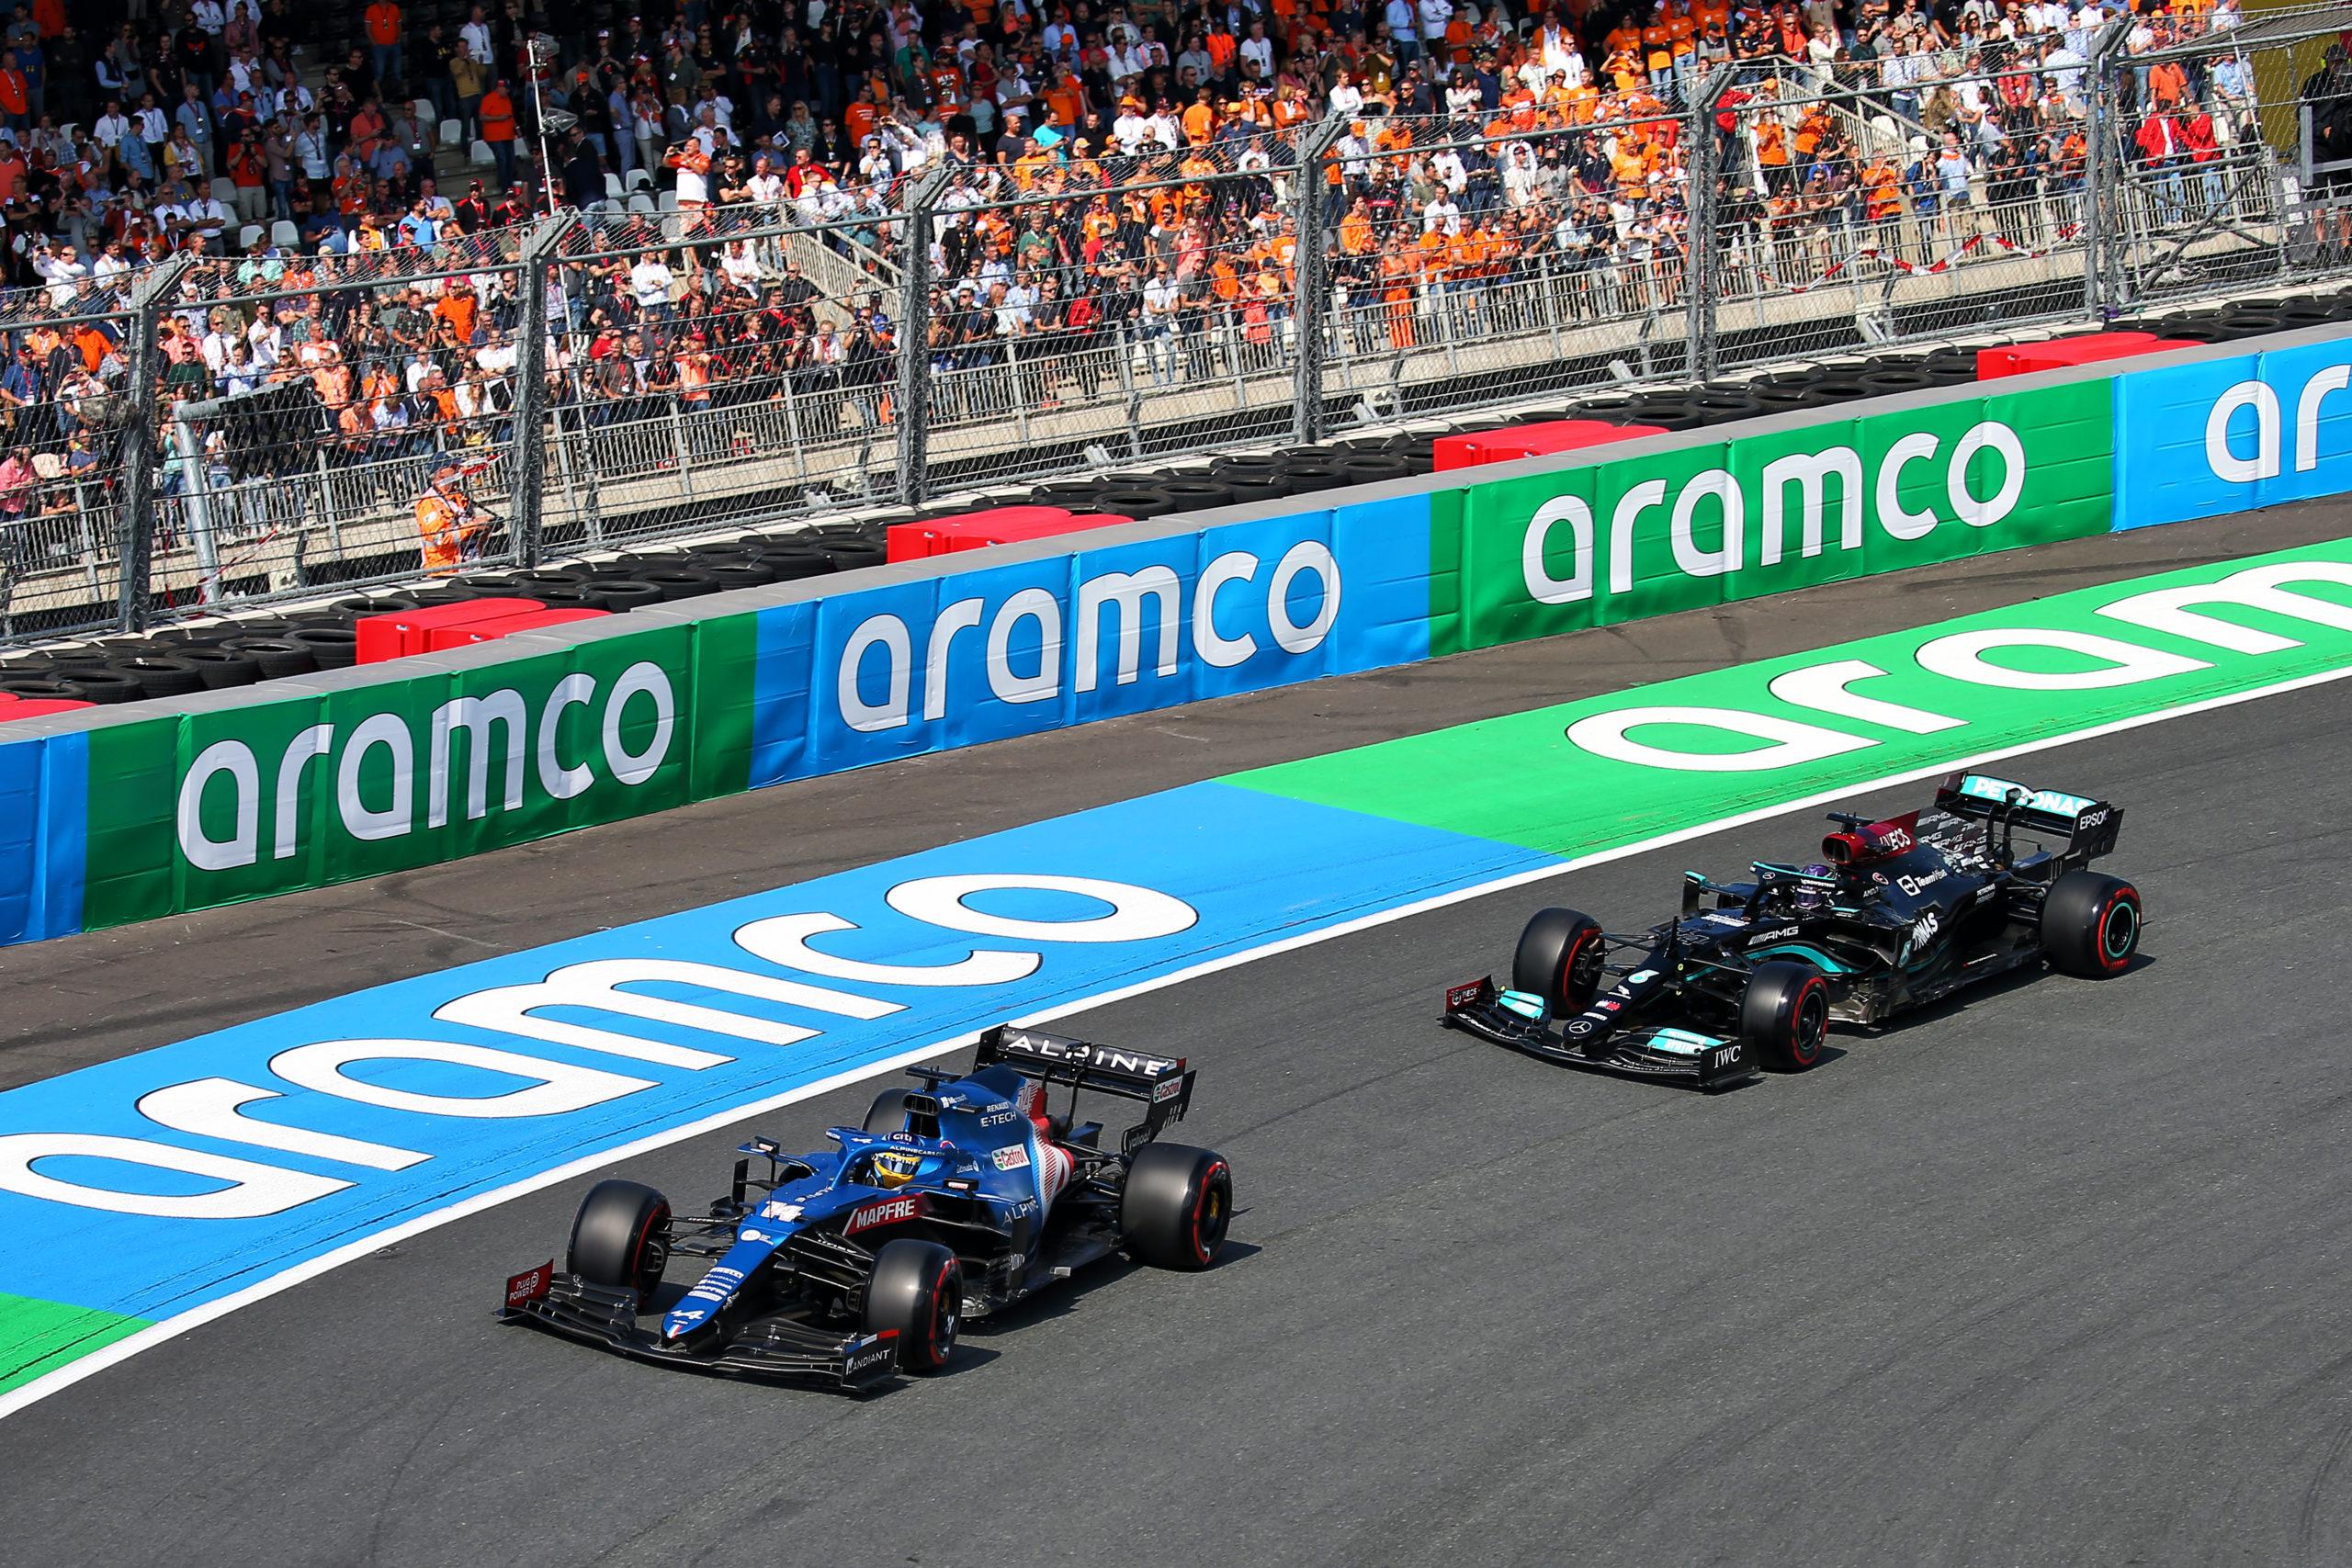 Fernando Alonso (ESP), Alpine F1 Team A521, F1 Dutch Grand Prix at Zandvoort, 2021